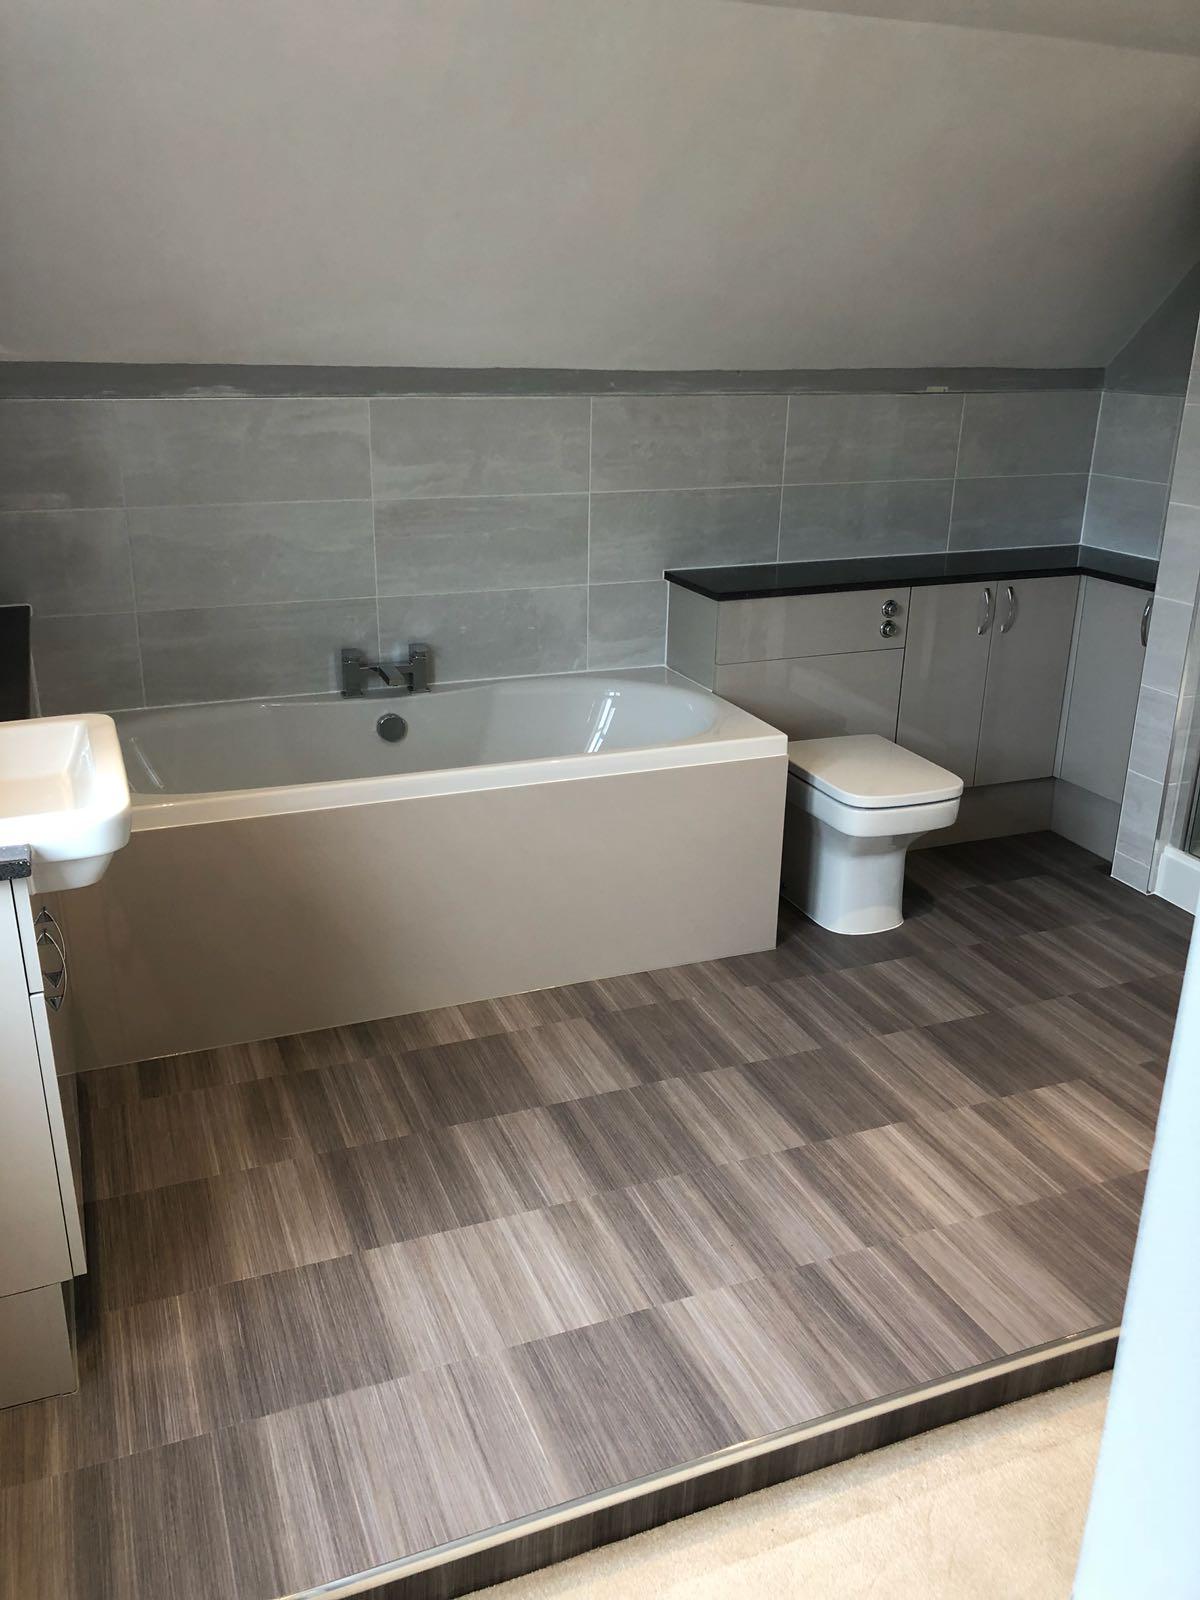 Complete Bathroom Refit A D J Harris - Bathroom refit